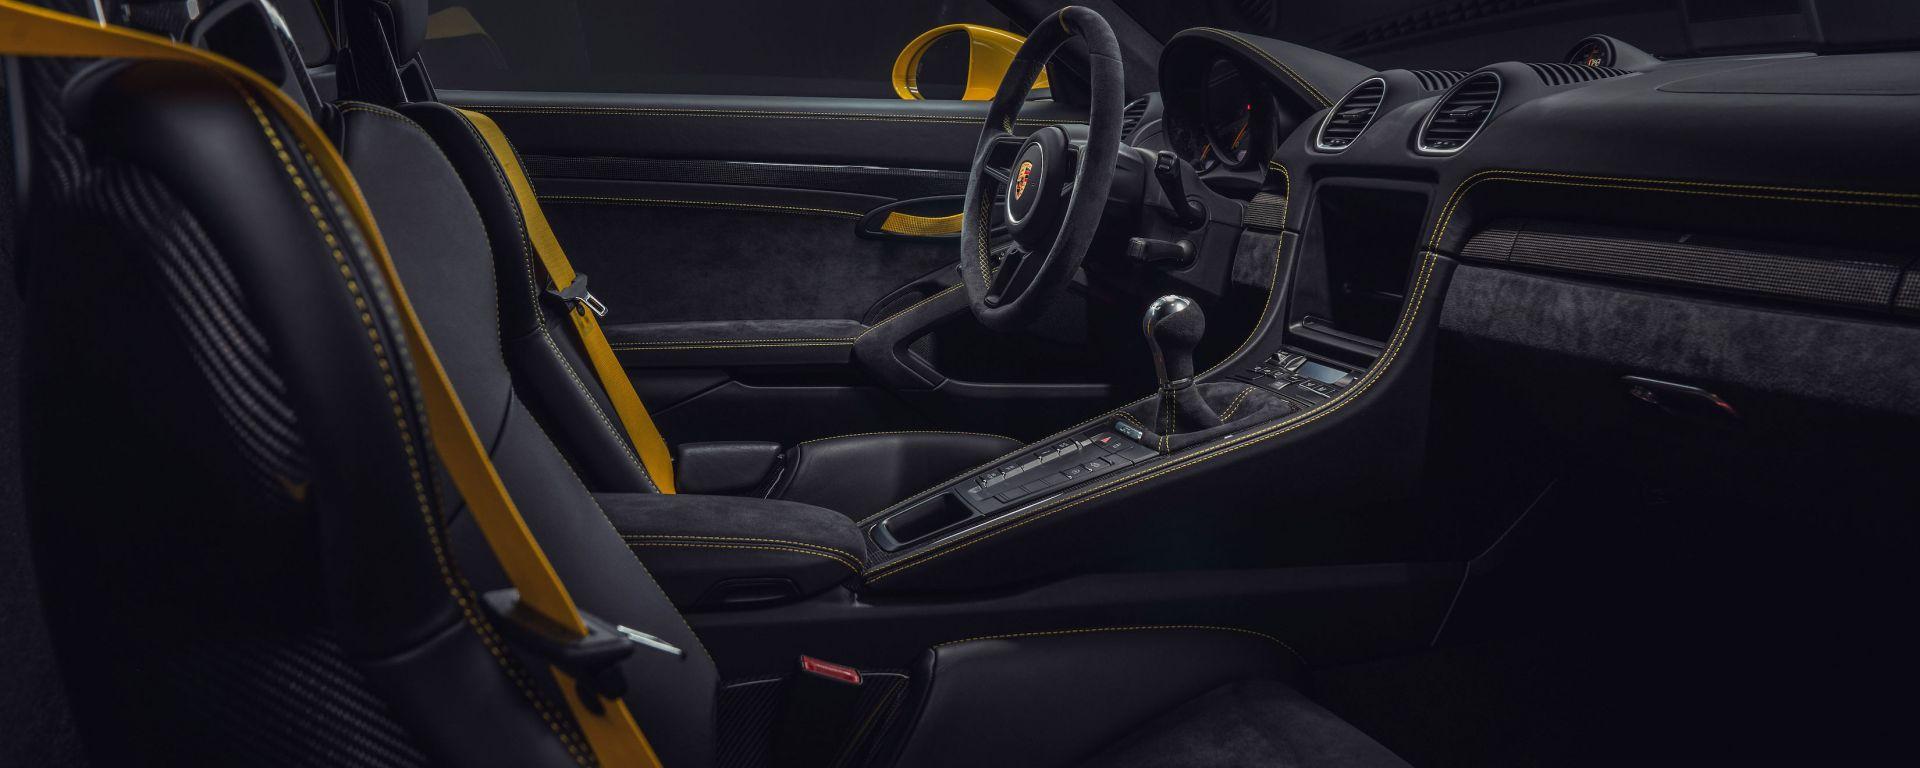 Porsche Cayman 718 GT4 gli interni